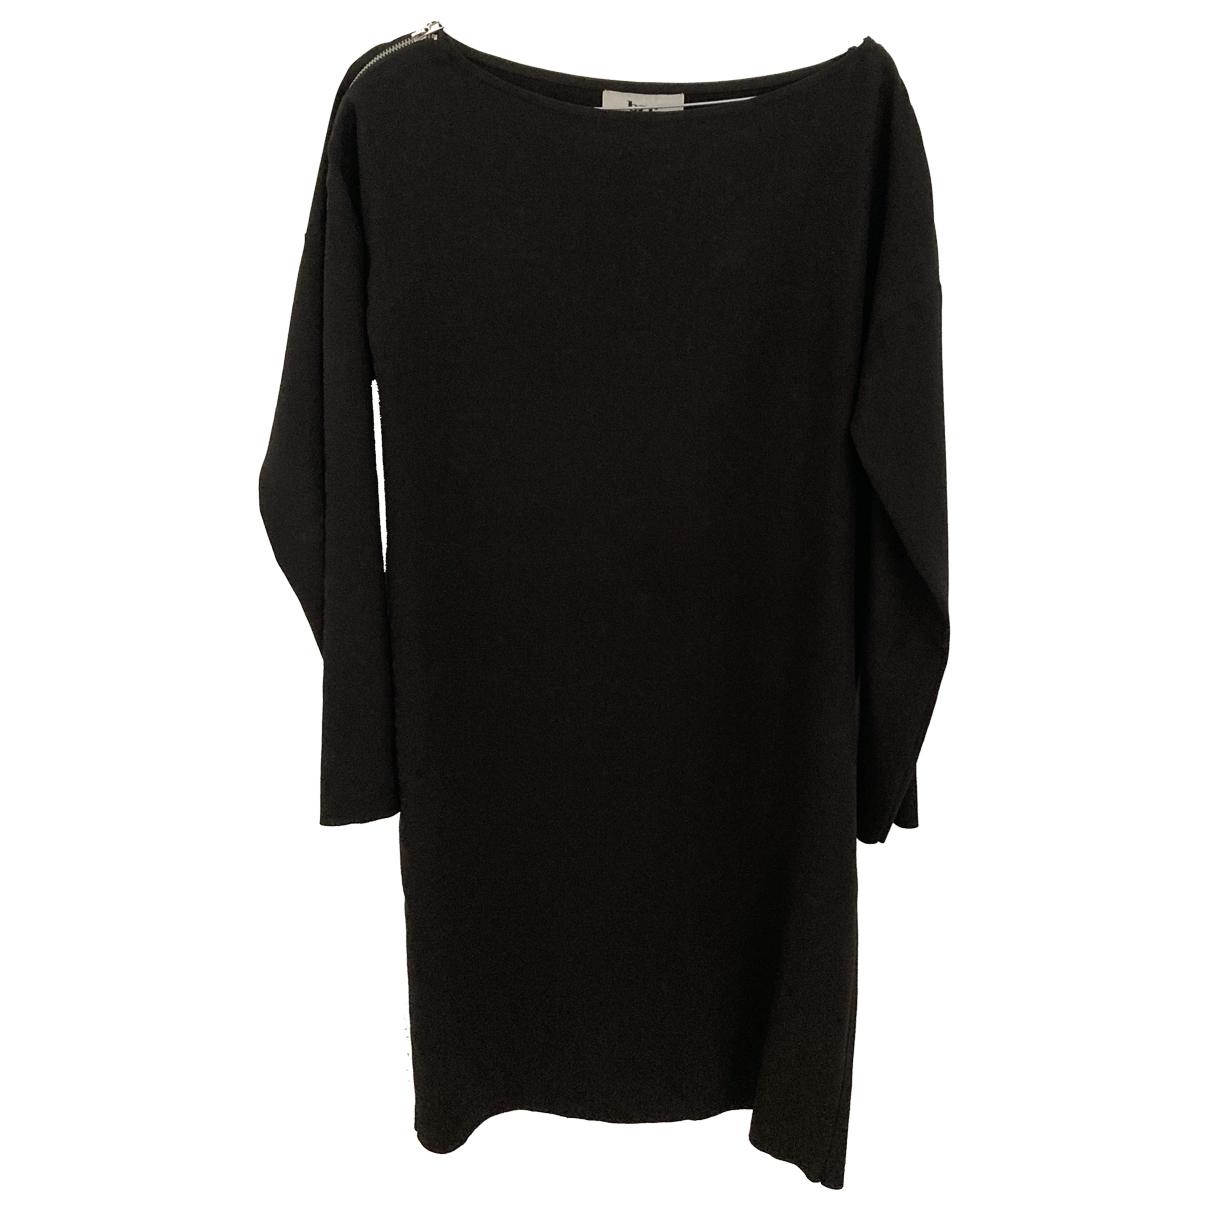 Bruuns Bazaar \N Kleid in  Schwarz Synthetik